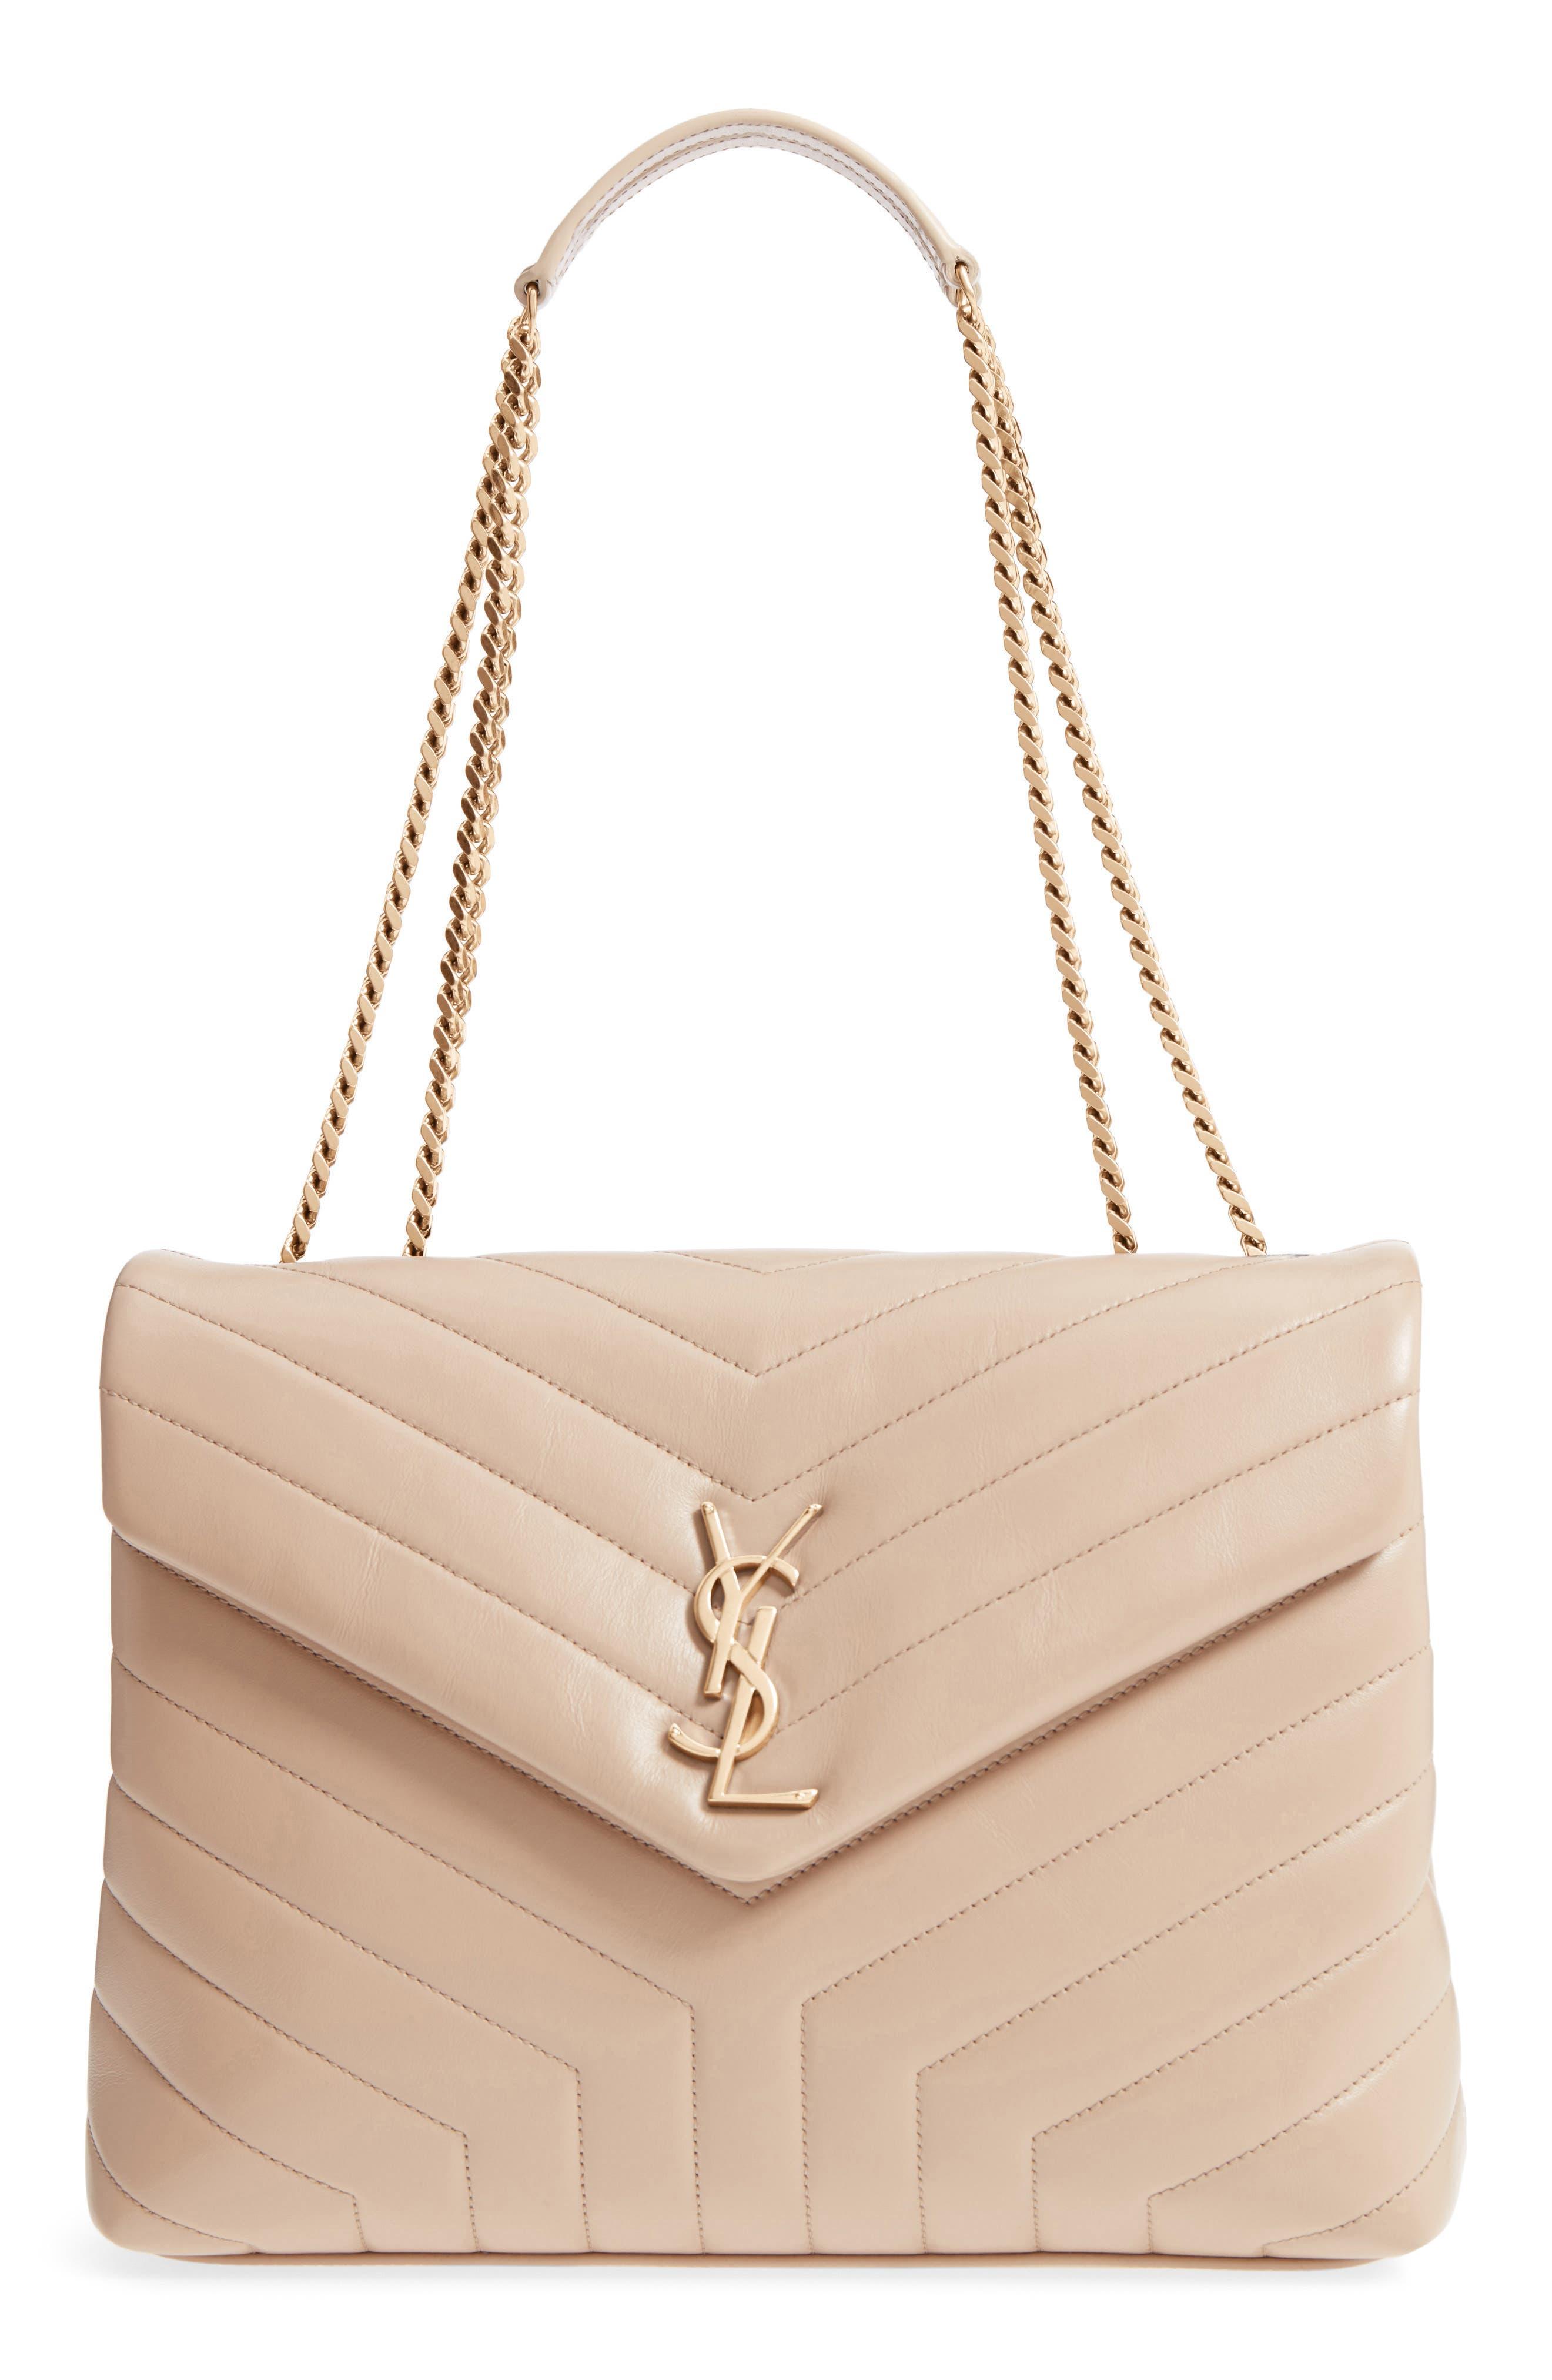 Medium Loulou Matelassé Calfskin Leather Shoulder Bag,                         Main,                         color, LIGHT NATURAL